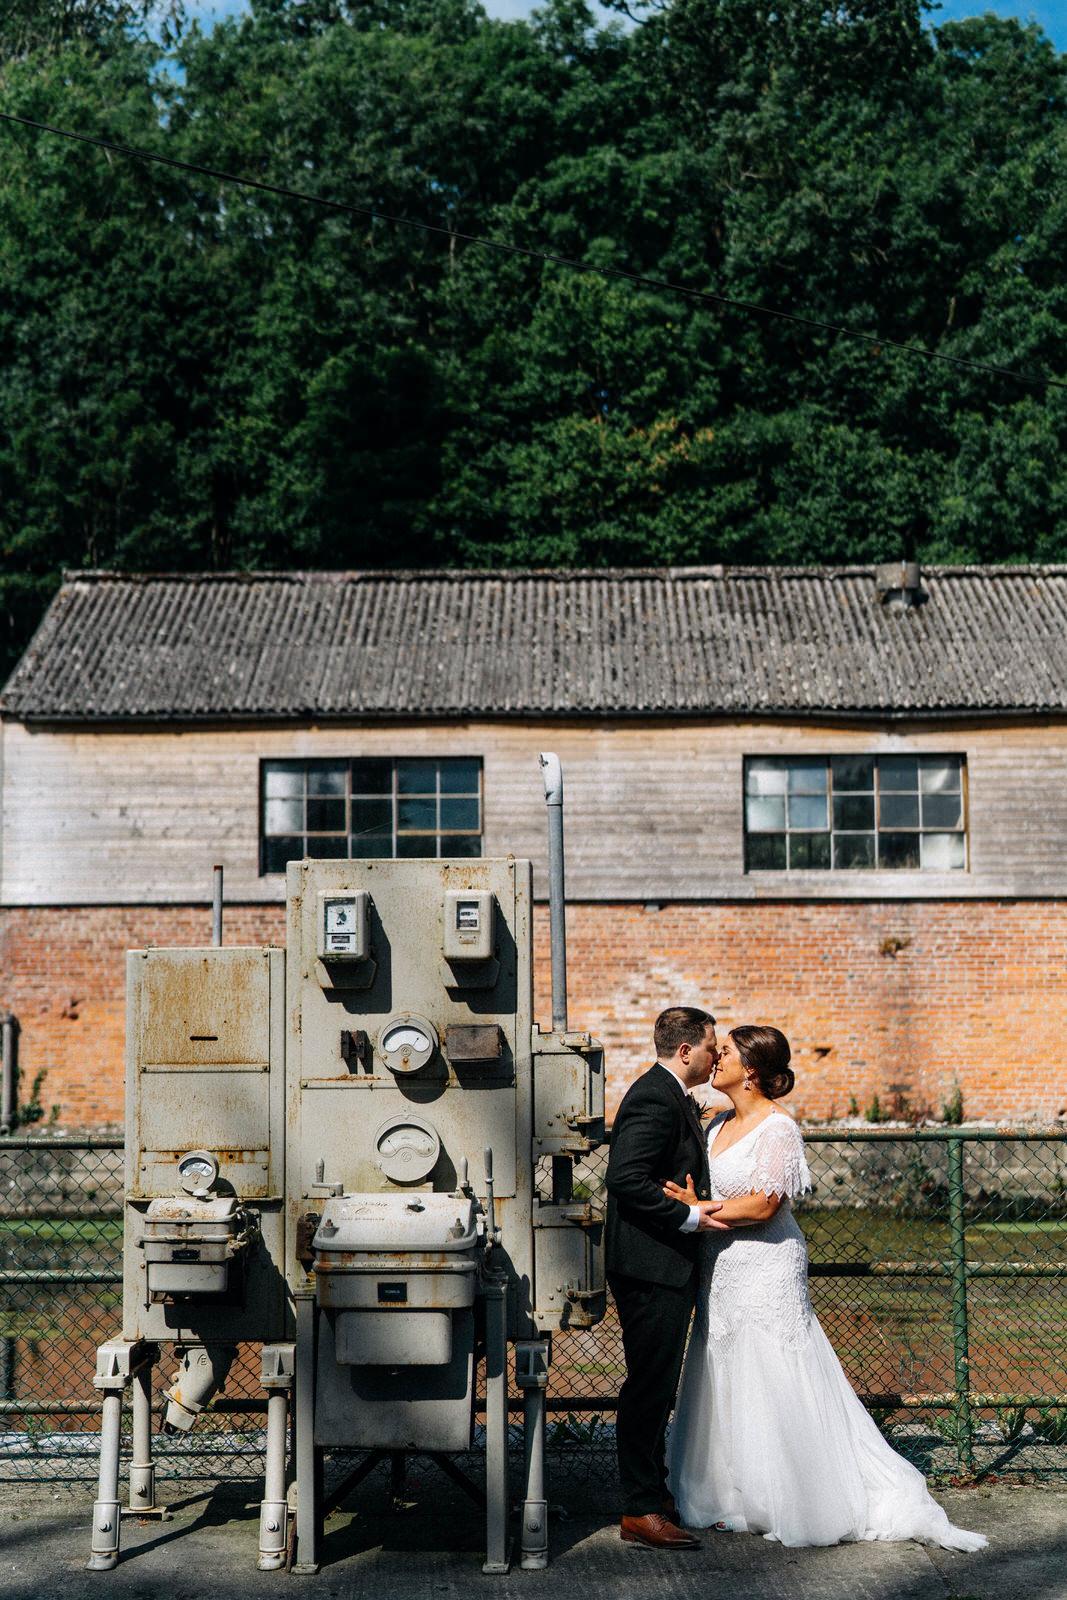 wedding photographer dublin 1,029 132